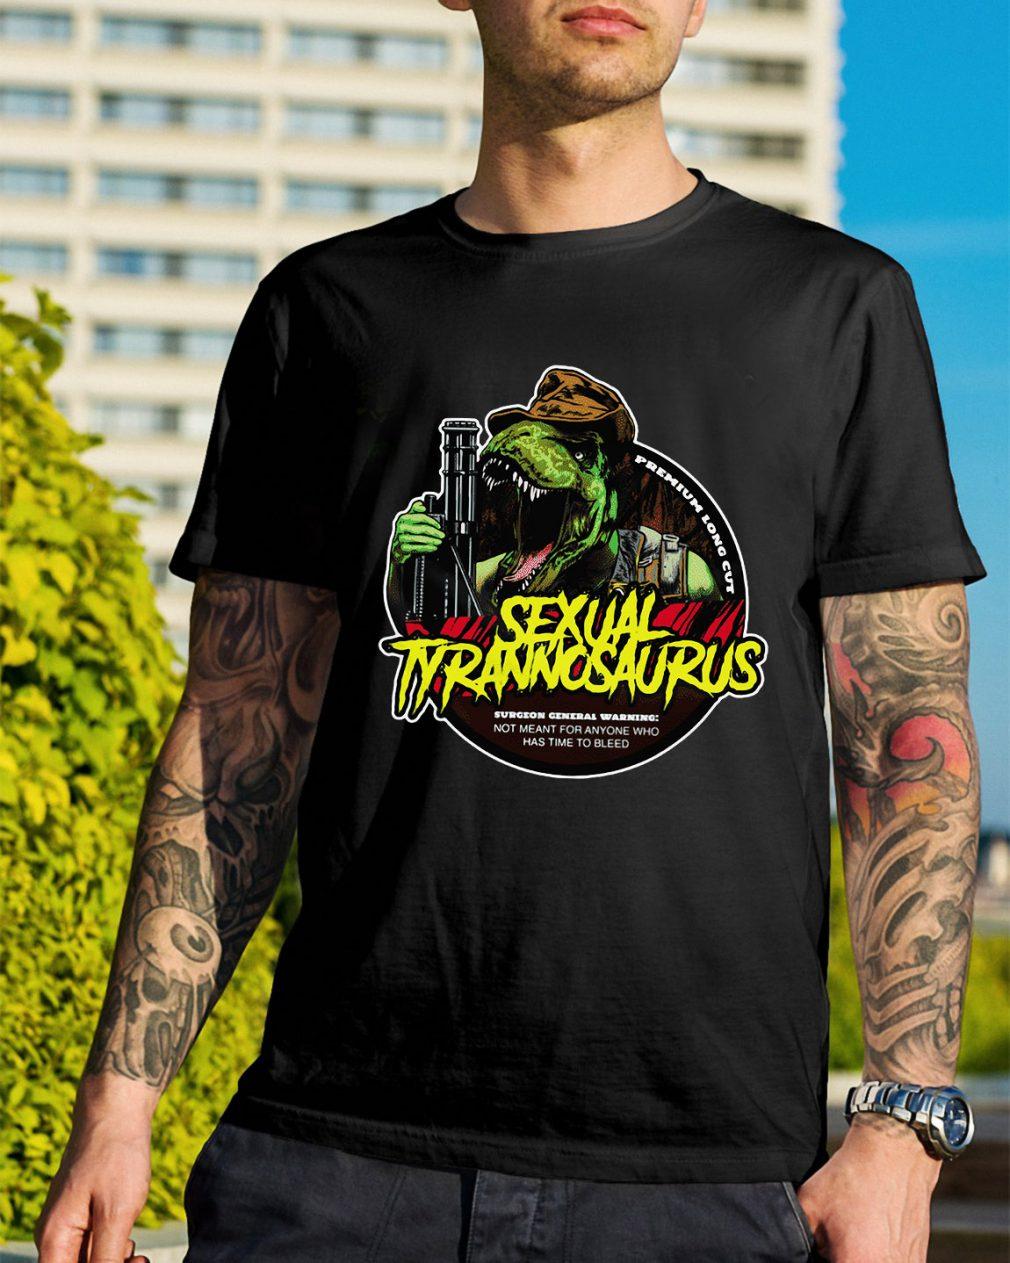 Sexual Tyrannosaurus surgeon general warning shirt